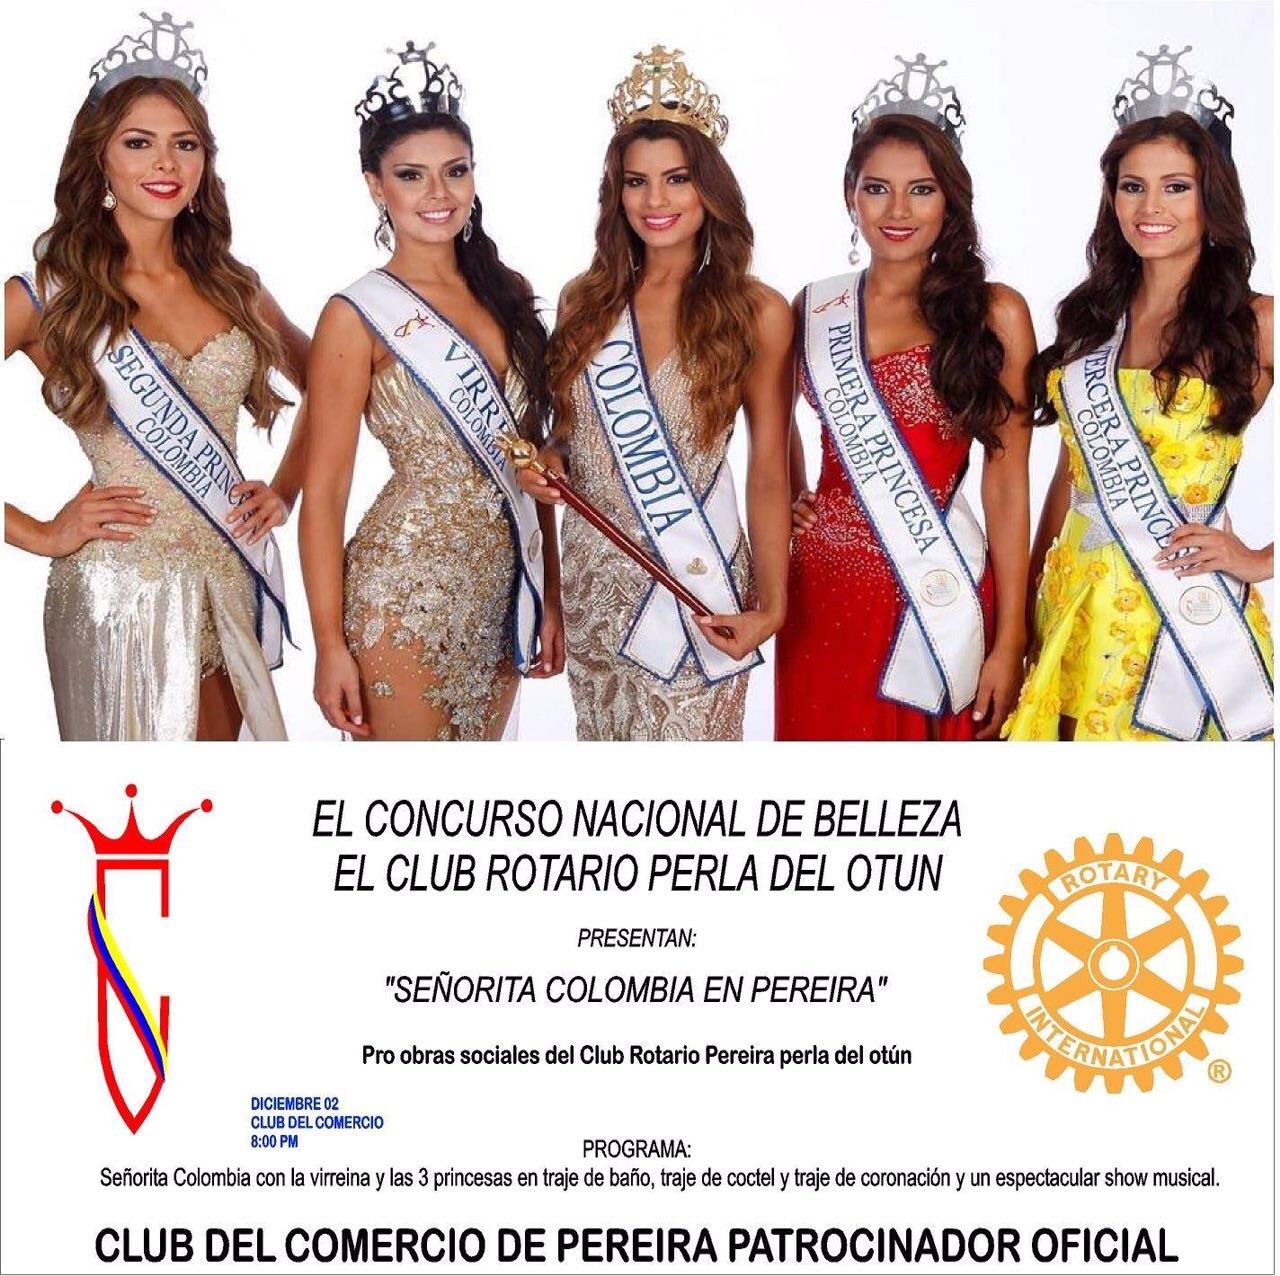 SEÑORITA COLOMBIA EN PEREIRA 2014